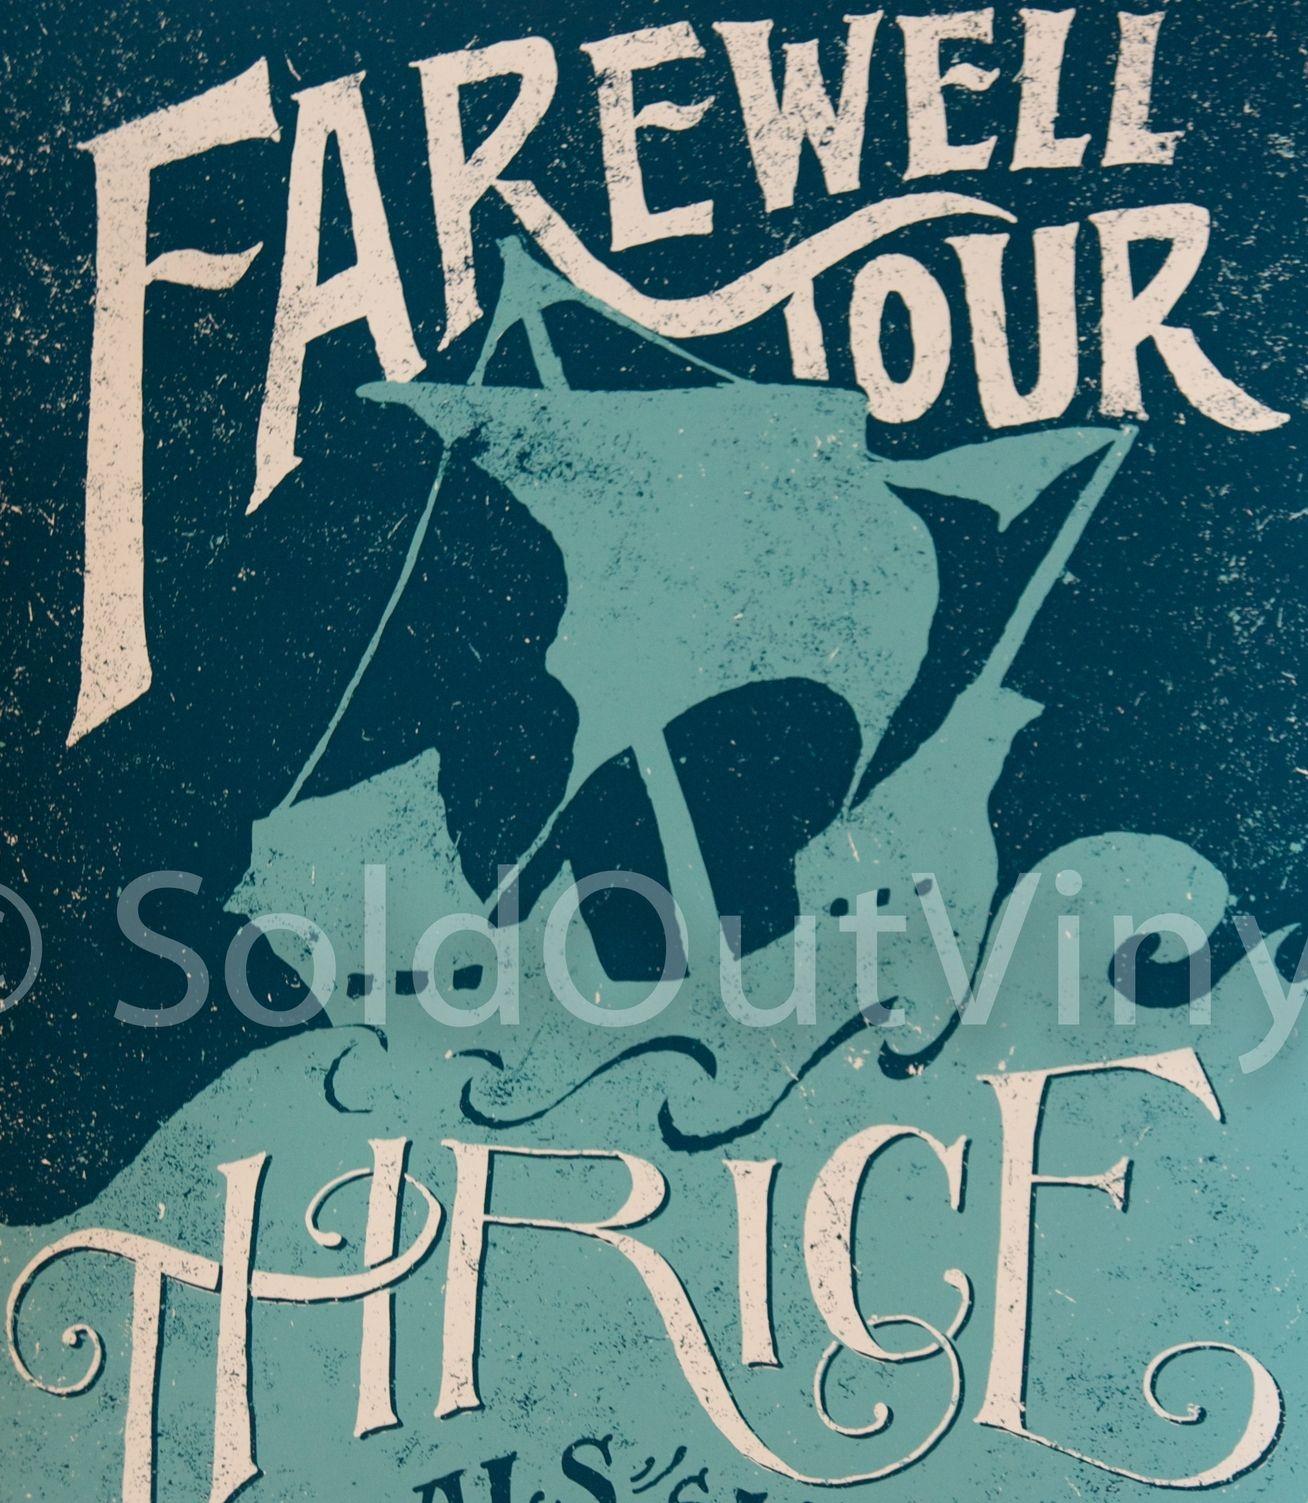 Thrice Farwell Tour Poster Art Print Soldoutvinyl Tour Posters Posters Art Prints Art Prints